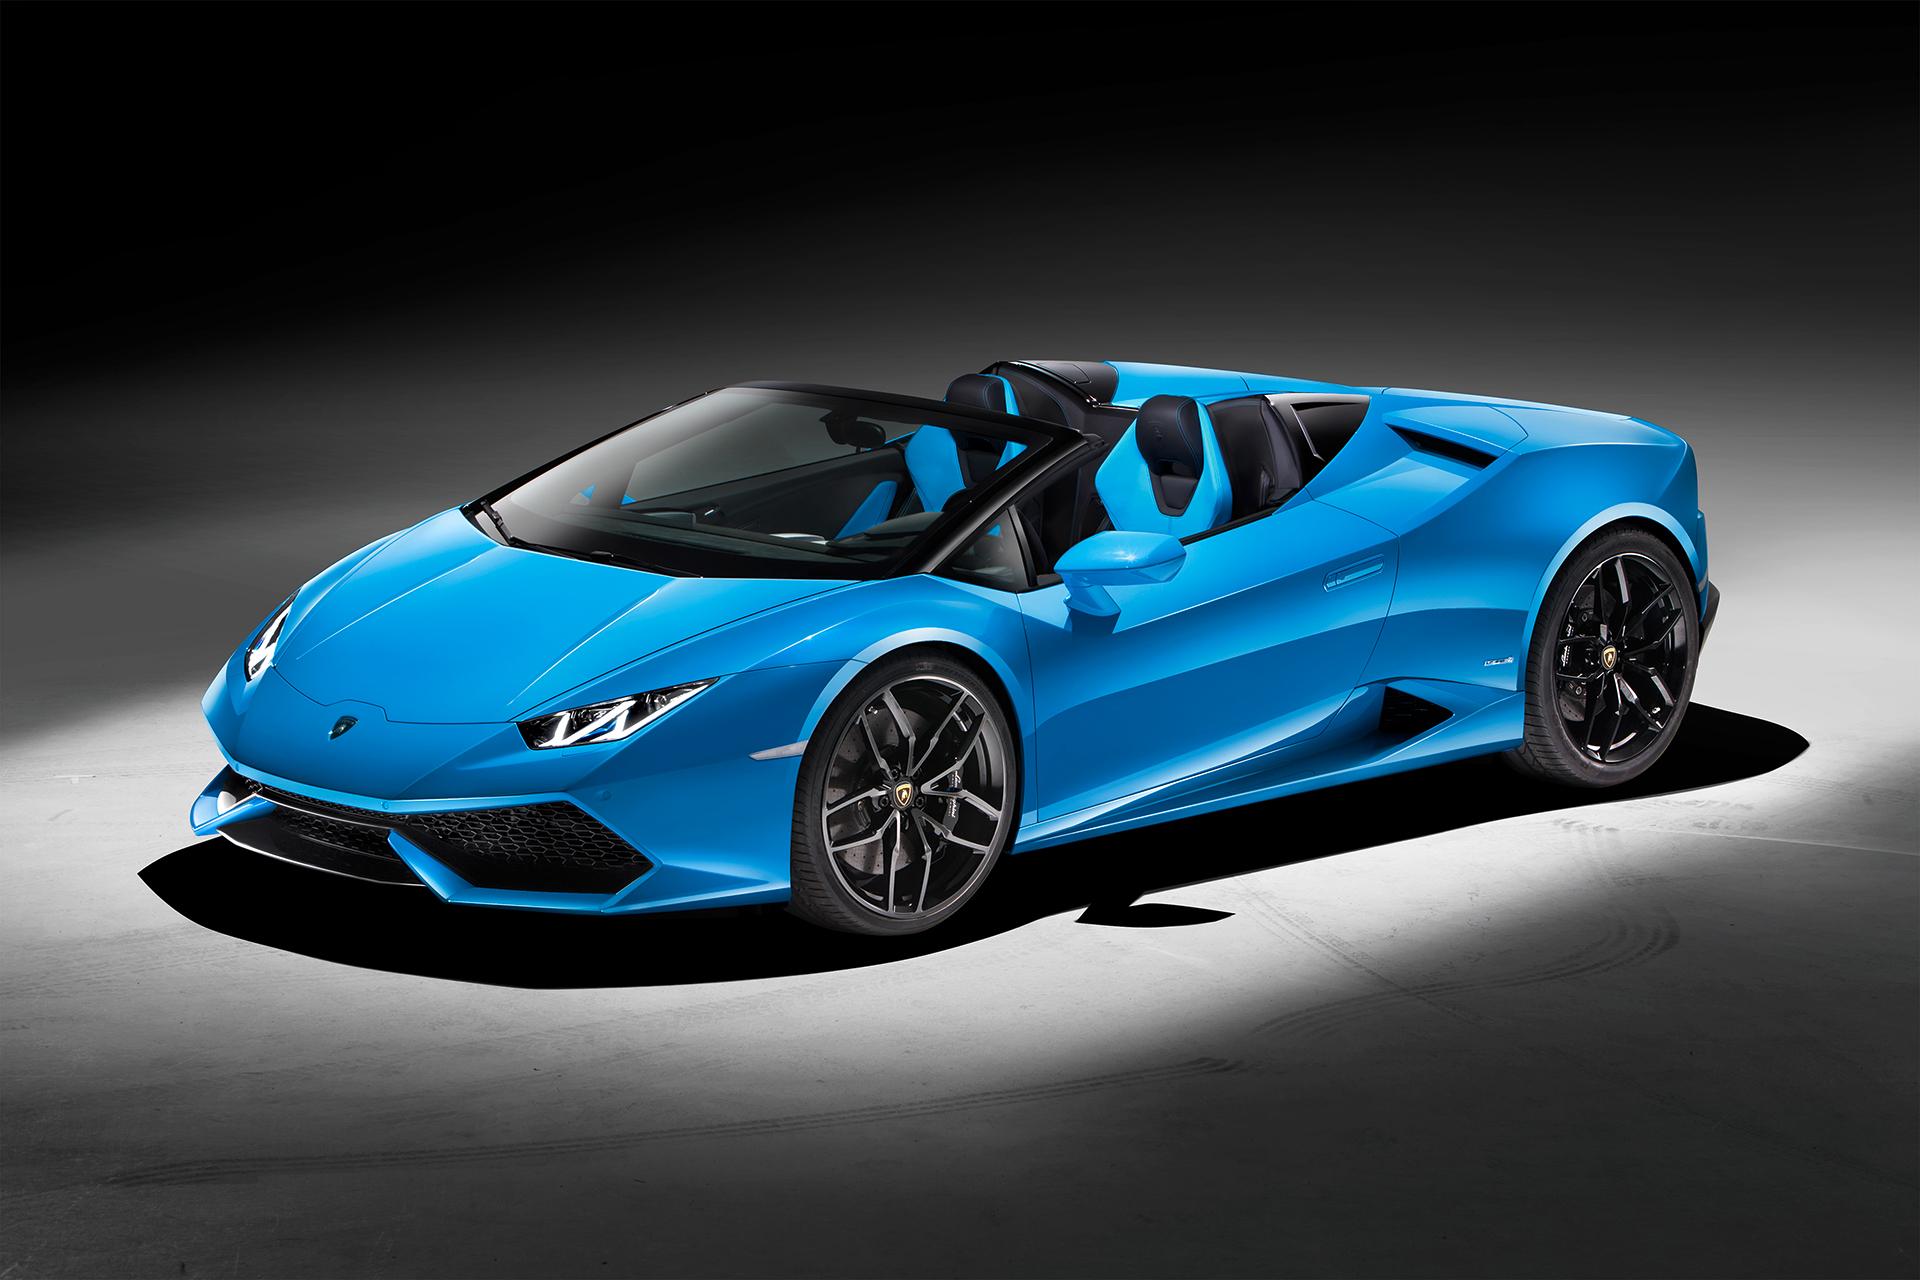 Lamborghini Huracán LP 610-4 Spyder - profil avant / front side-face